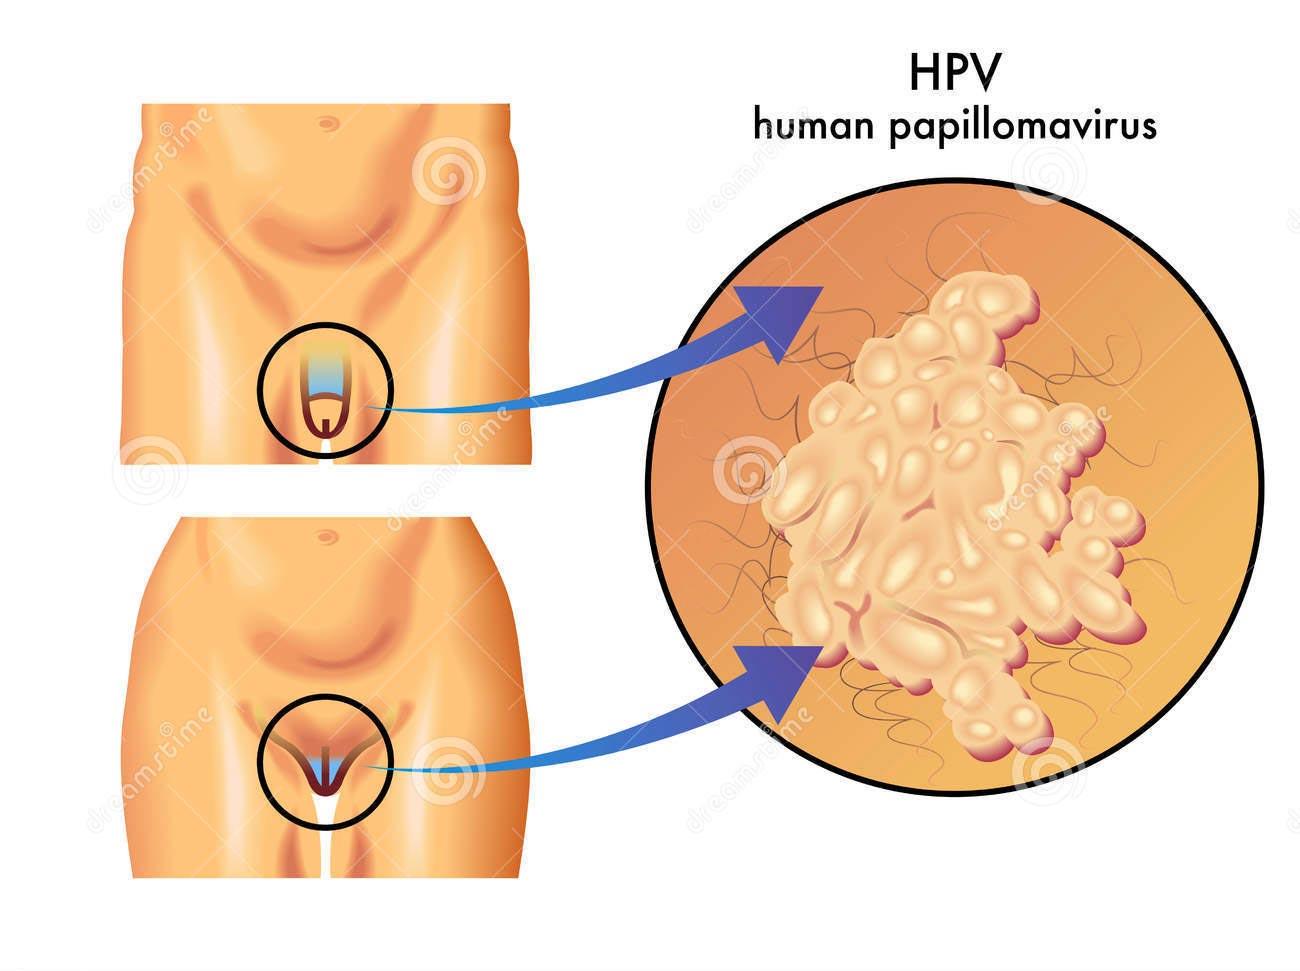 Papilloma e tumore alla gola. PAPILLOMA - Definiția și sinonimele papilloma în dicționarul Italiană